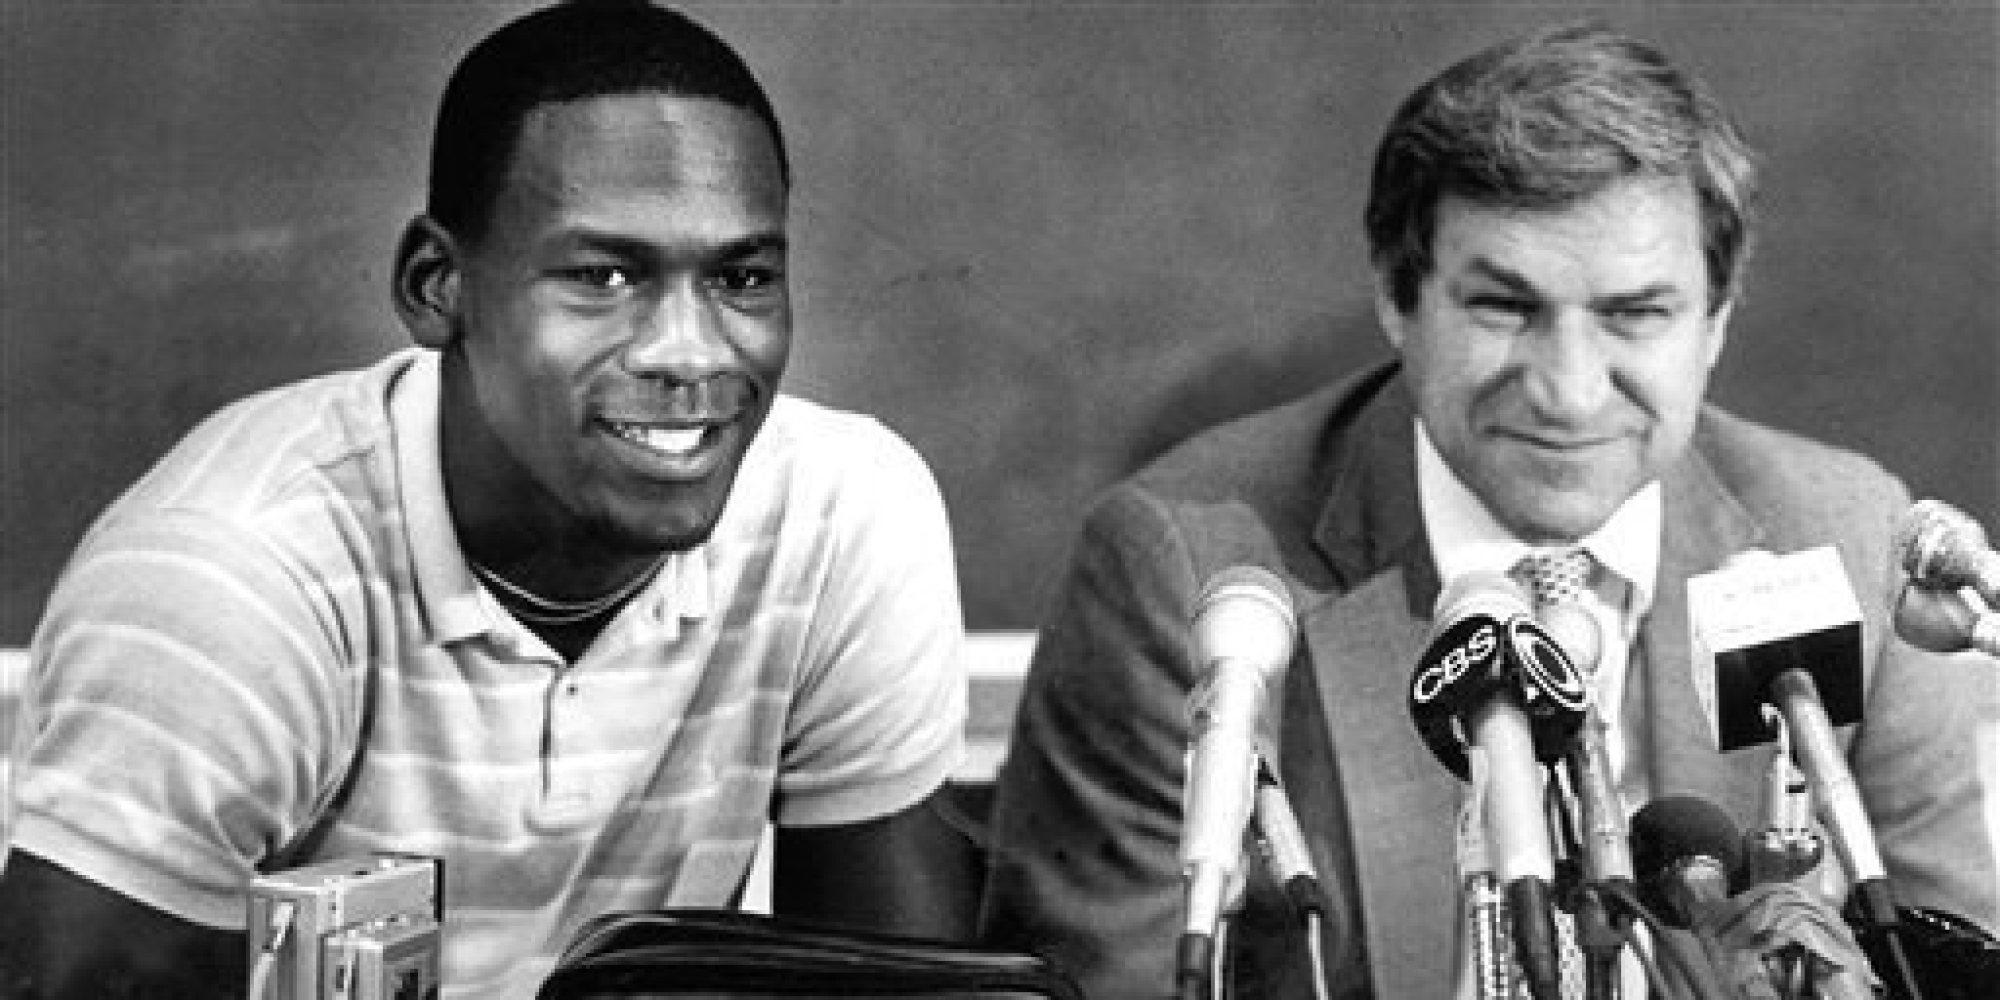 Dean Smith and Michael Jordan